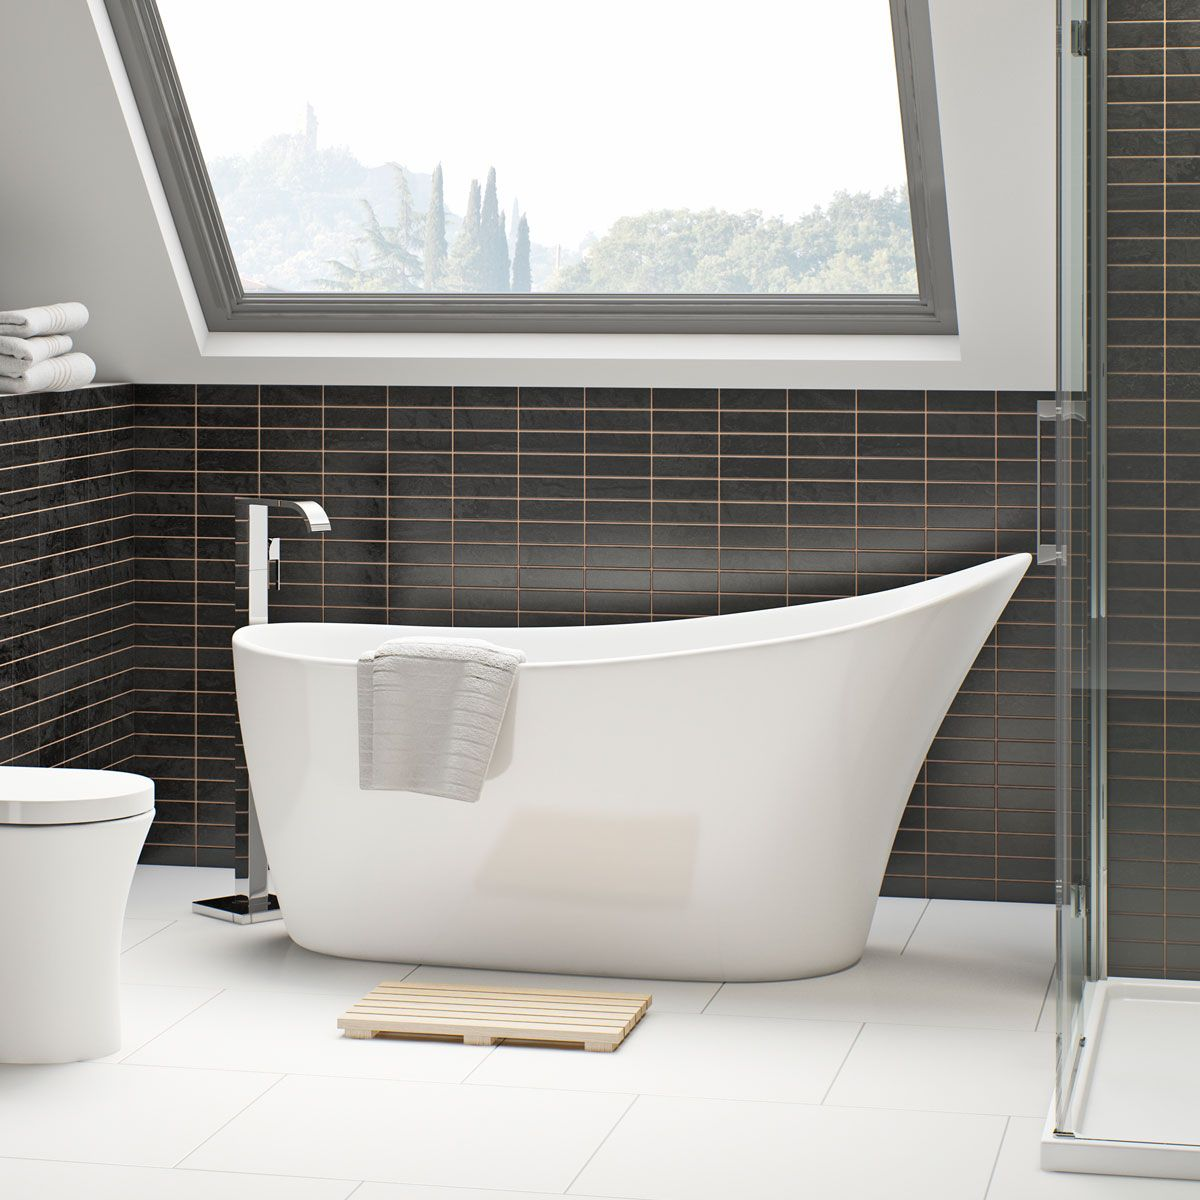 Mode Hardy freestanding bath 1600 x 750   Freestanding bath, Bath ...